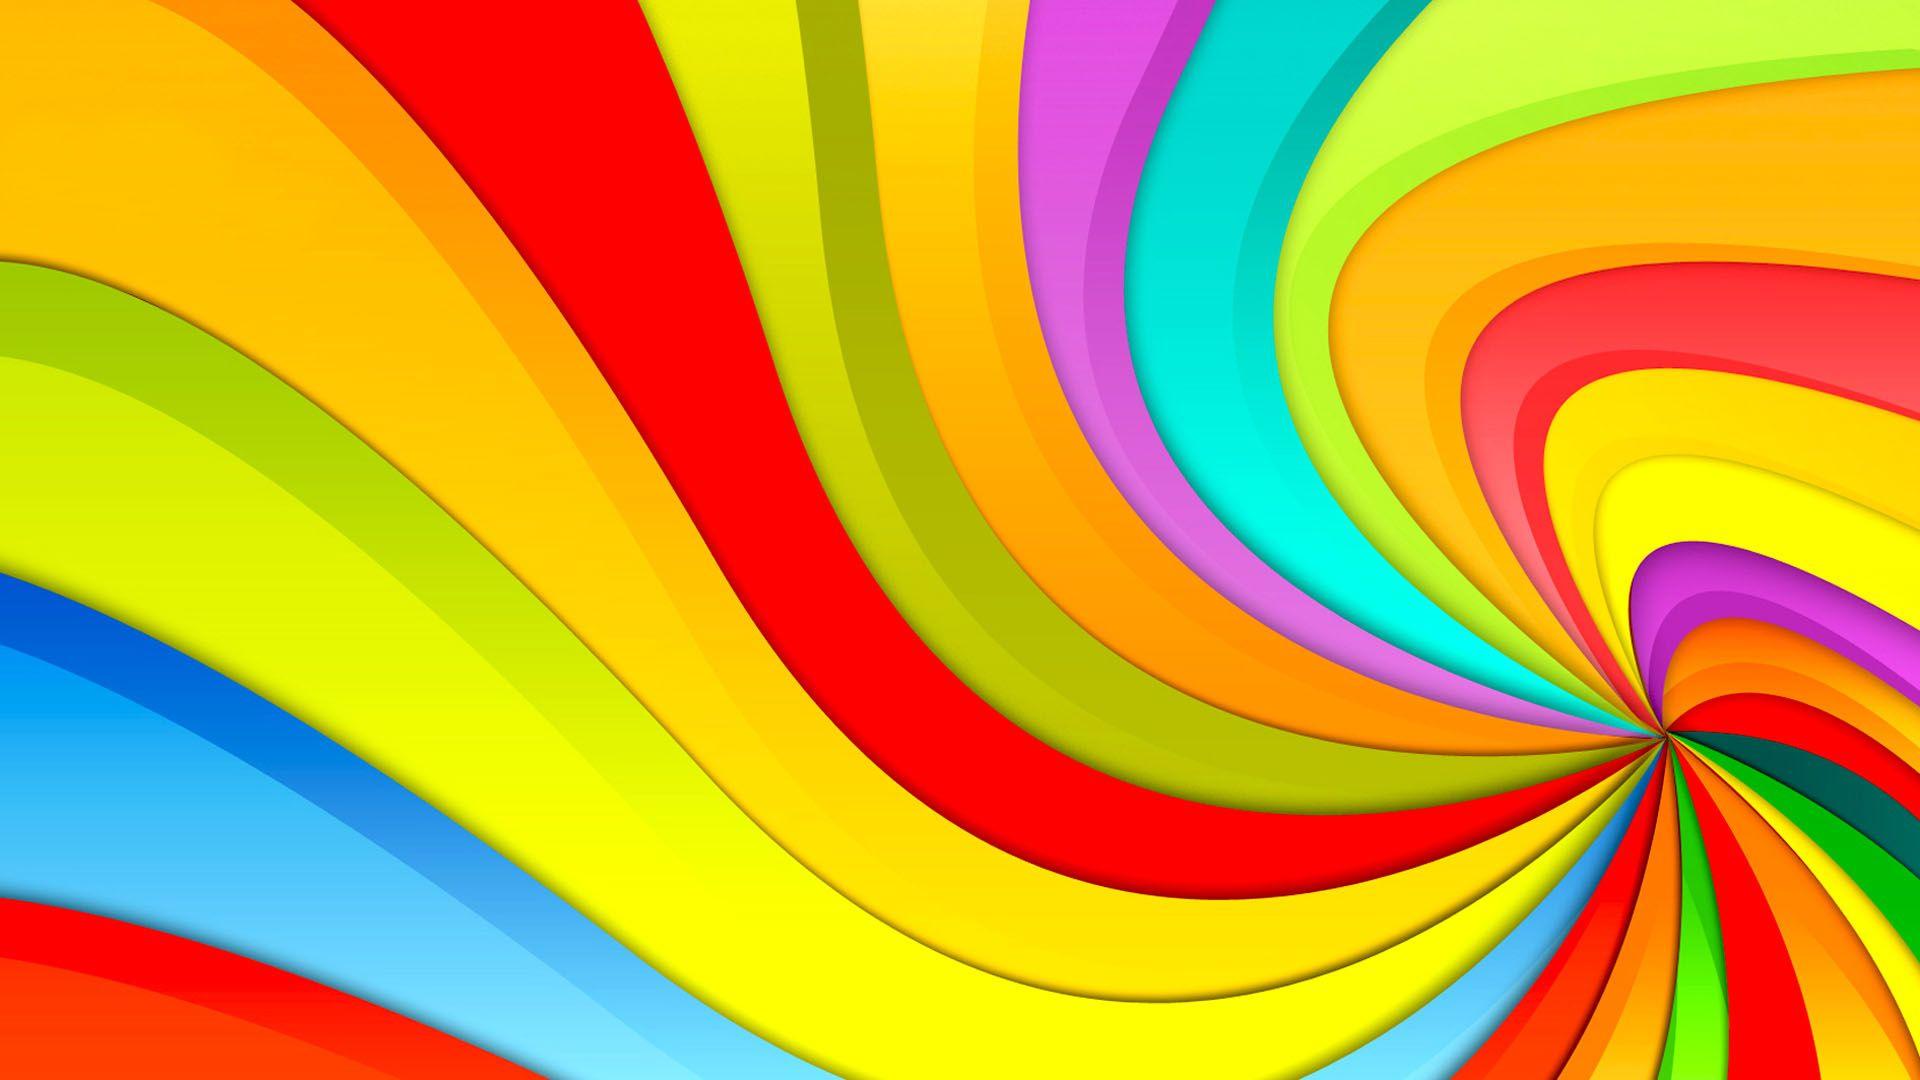 colorful desktop backgrounds colorful for desktop hd wallpapers